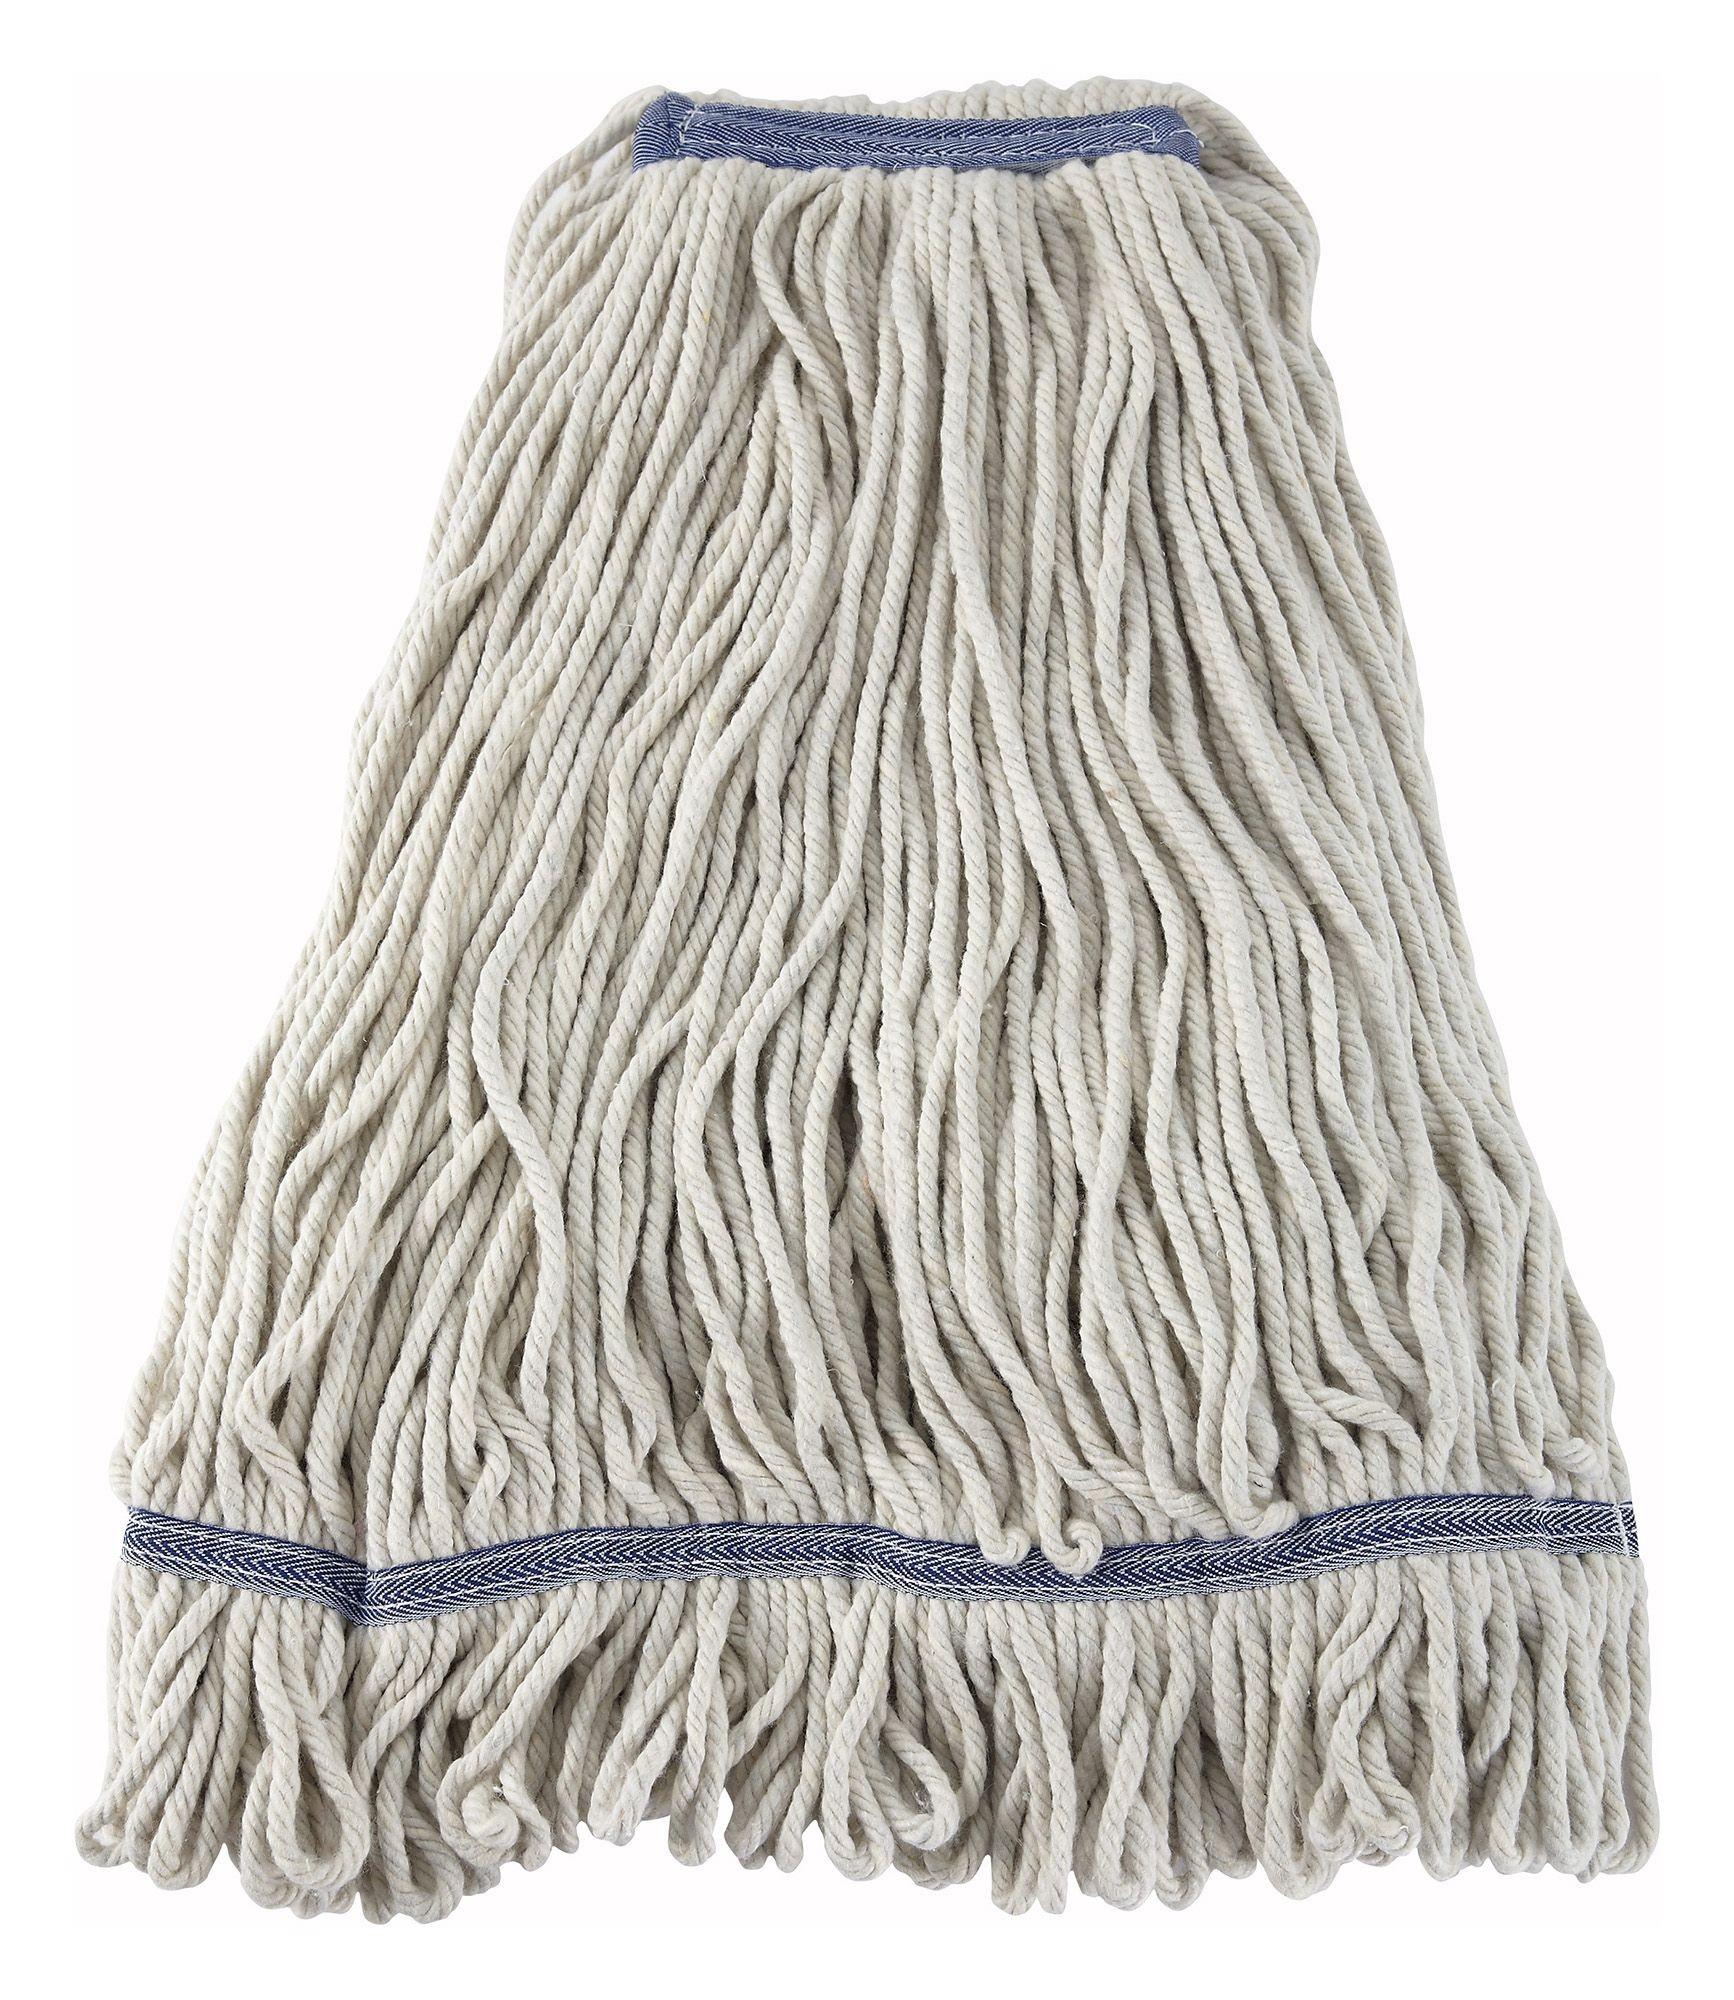 White Yarn Looped-End Wet Mop Head 800g 32 oz.